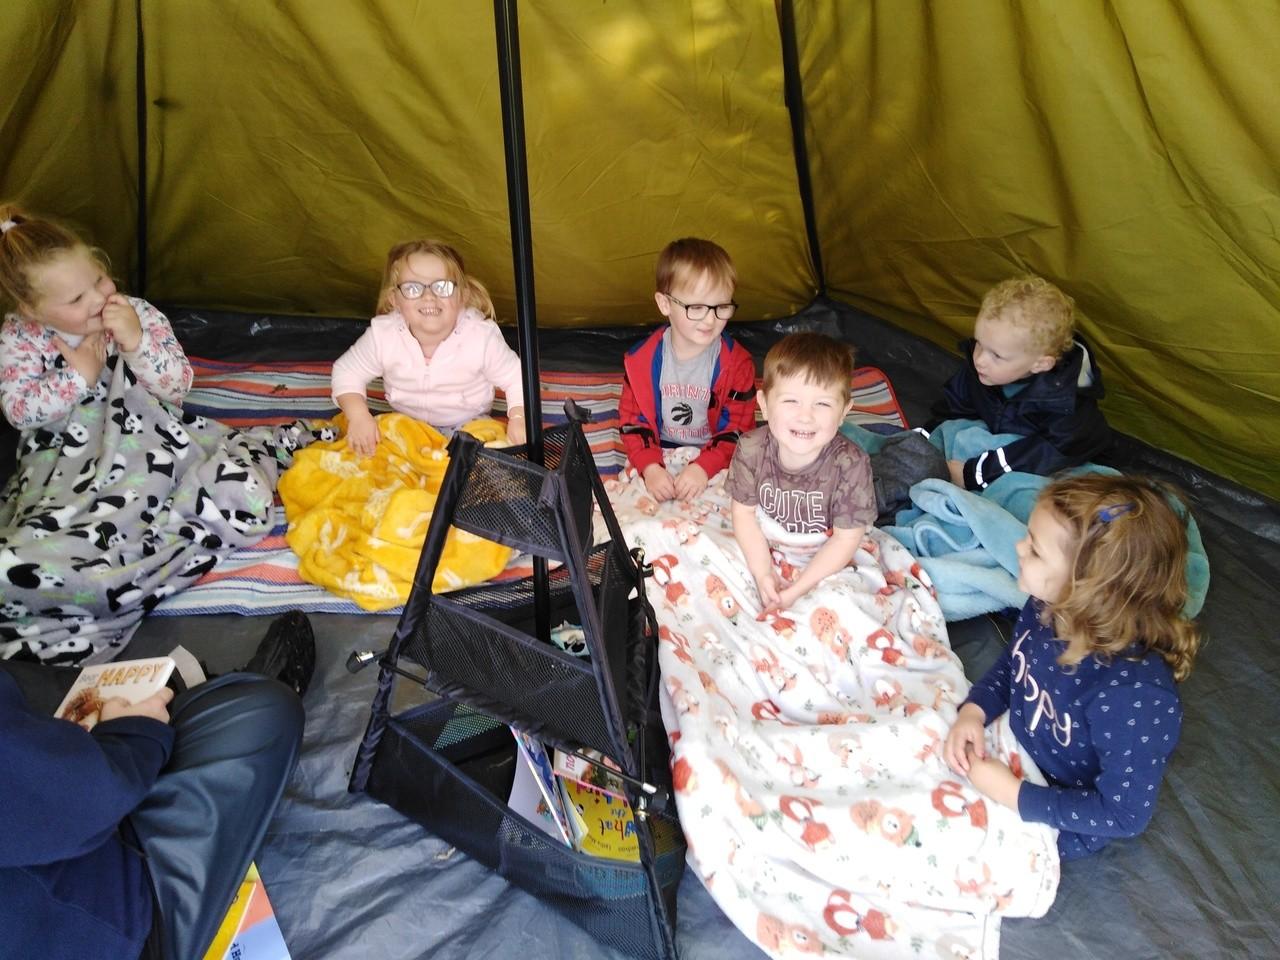 Donating blankets to Dalmuir Nursery | Asda Clydebank